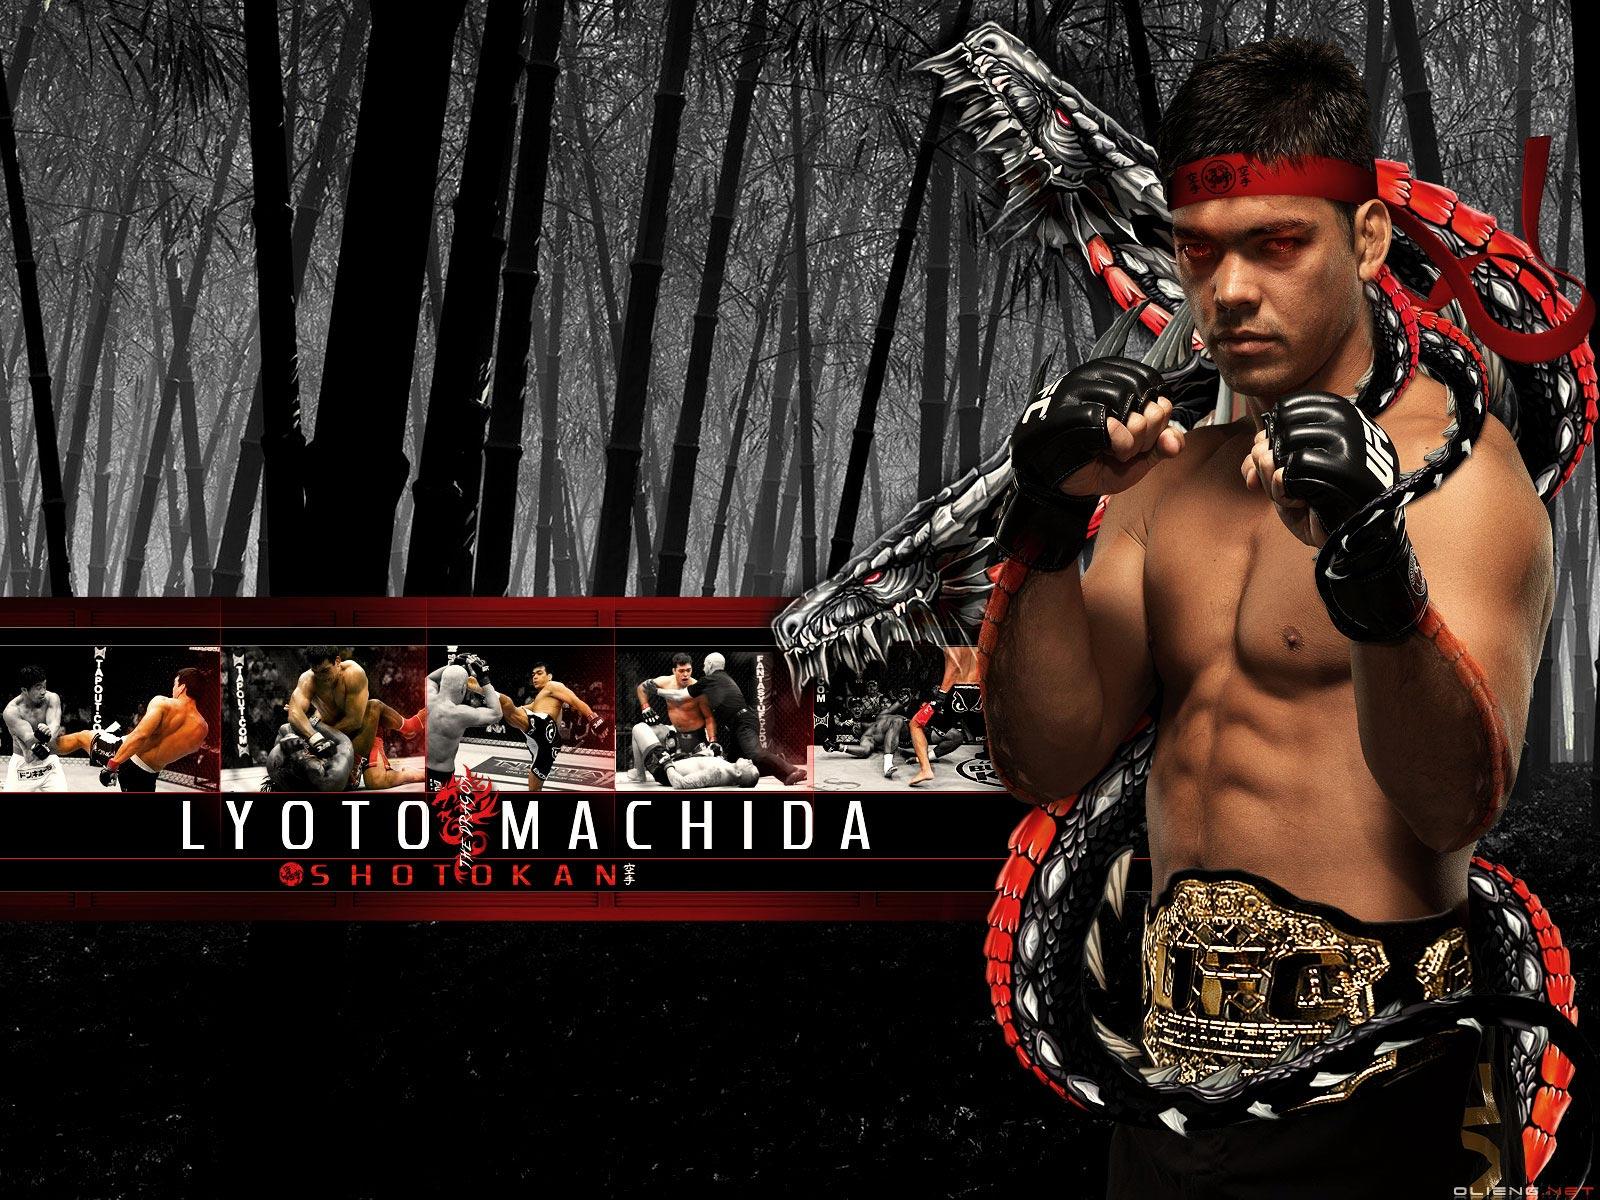 http://3.bp.blogspot.com/_ktpxbQsto34/TSo-AAYuCZI/AAAAAAAAA6U/vclkPikVe3U/s1600/Lyoto-Machida-UFC-Wallpaper.jpg